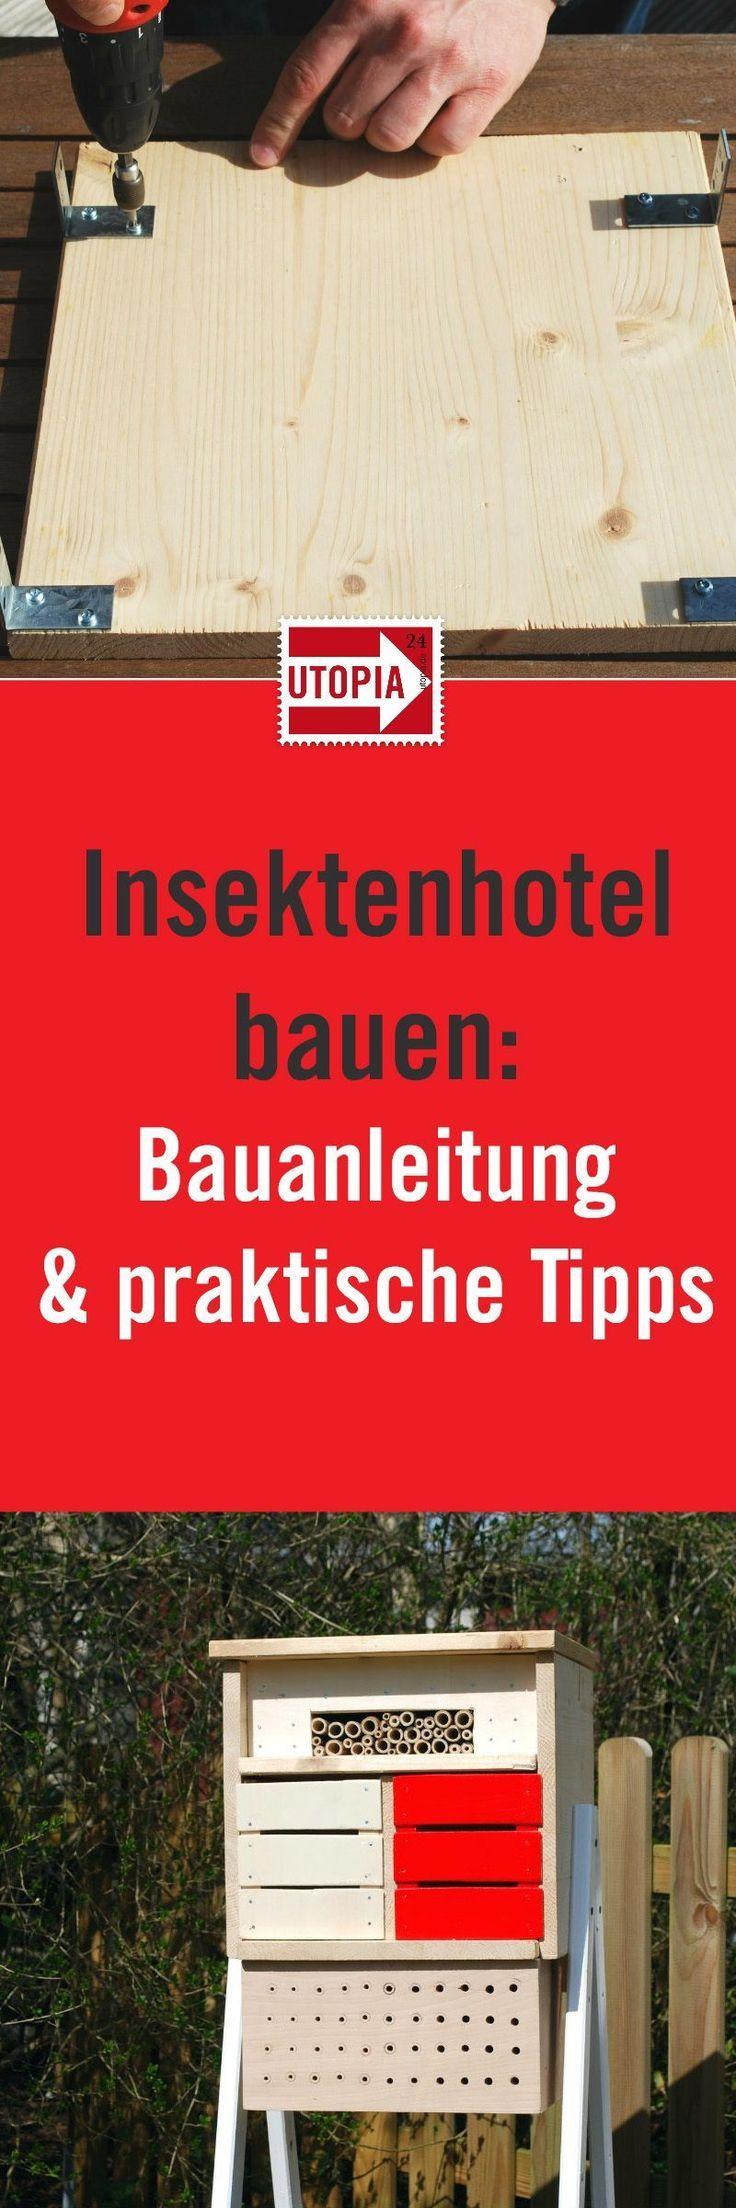 Insektenhotel bauen: Bauanleitung und Tipps - Utopia.de